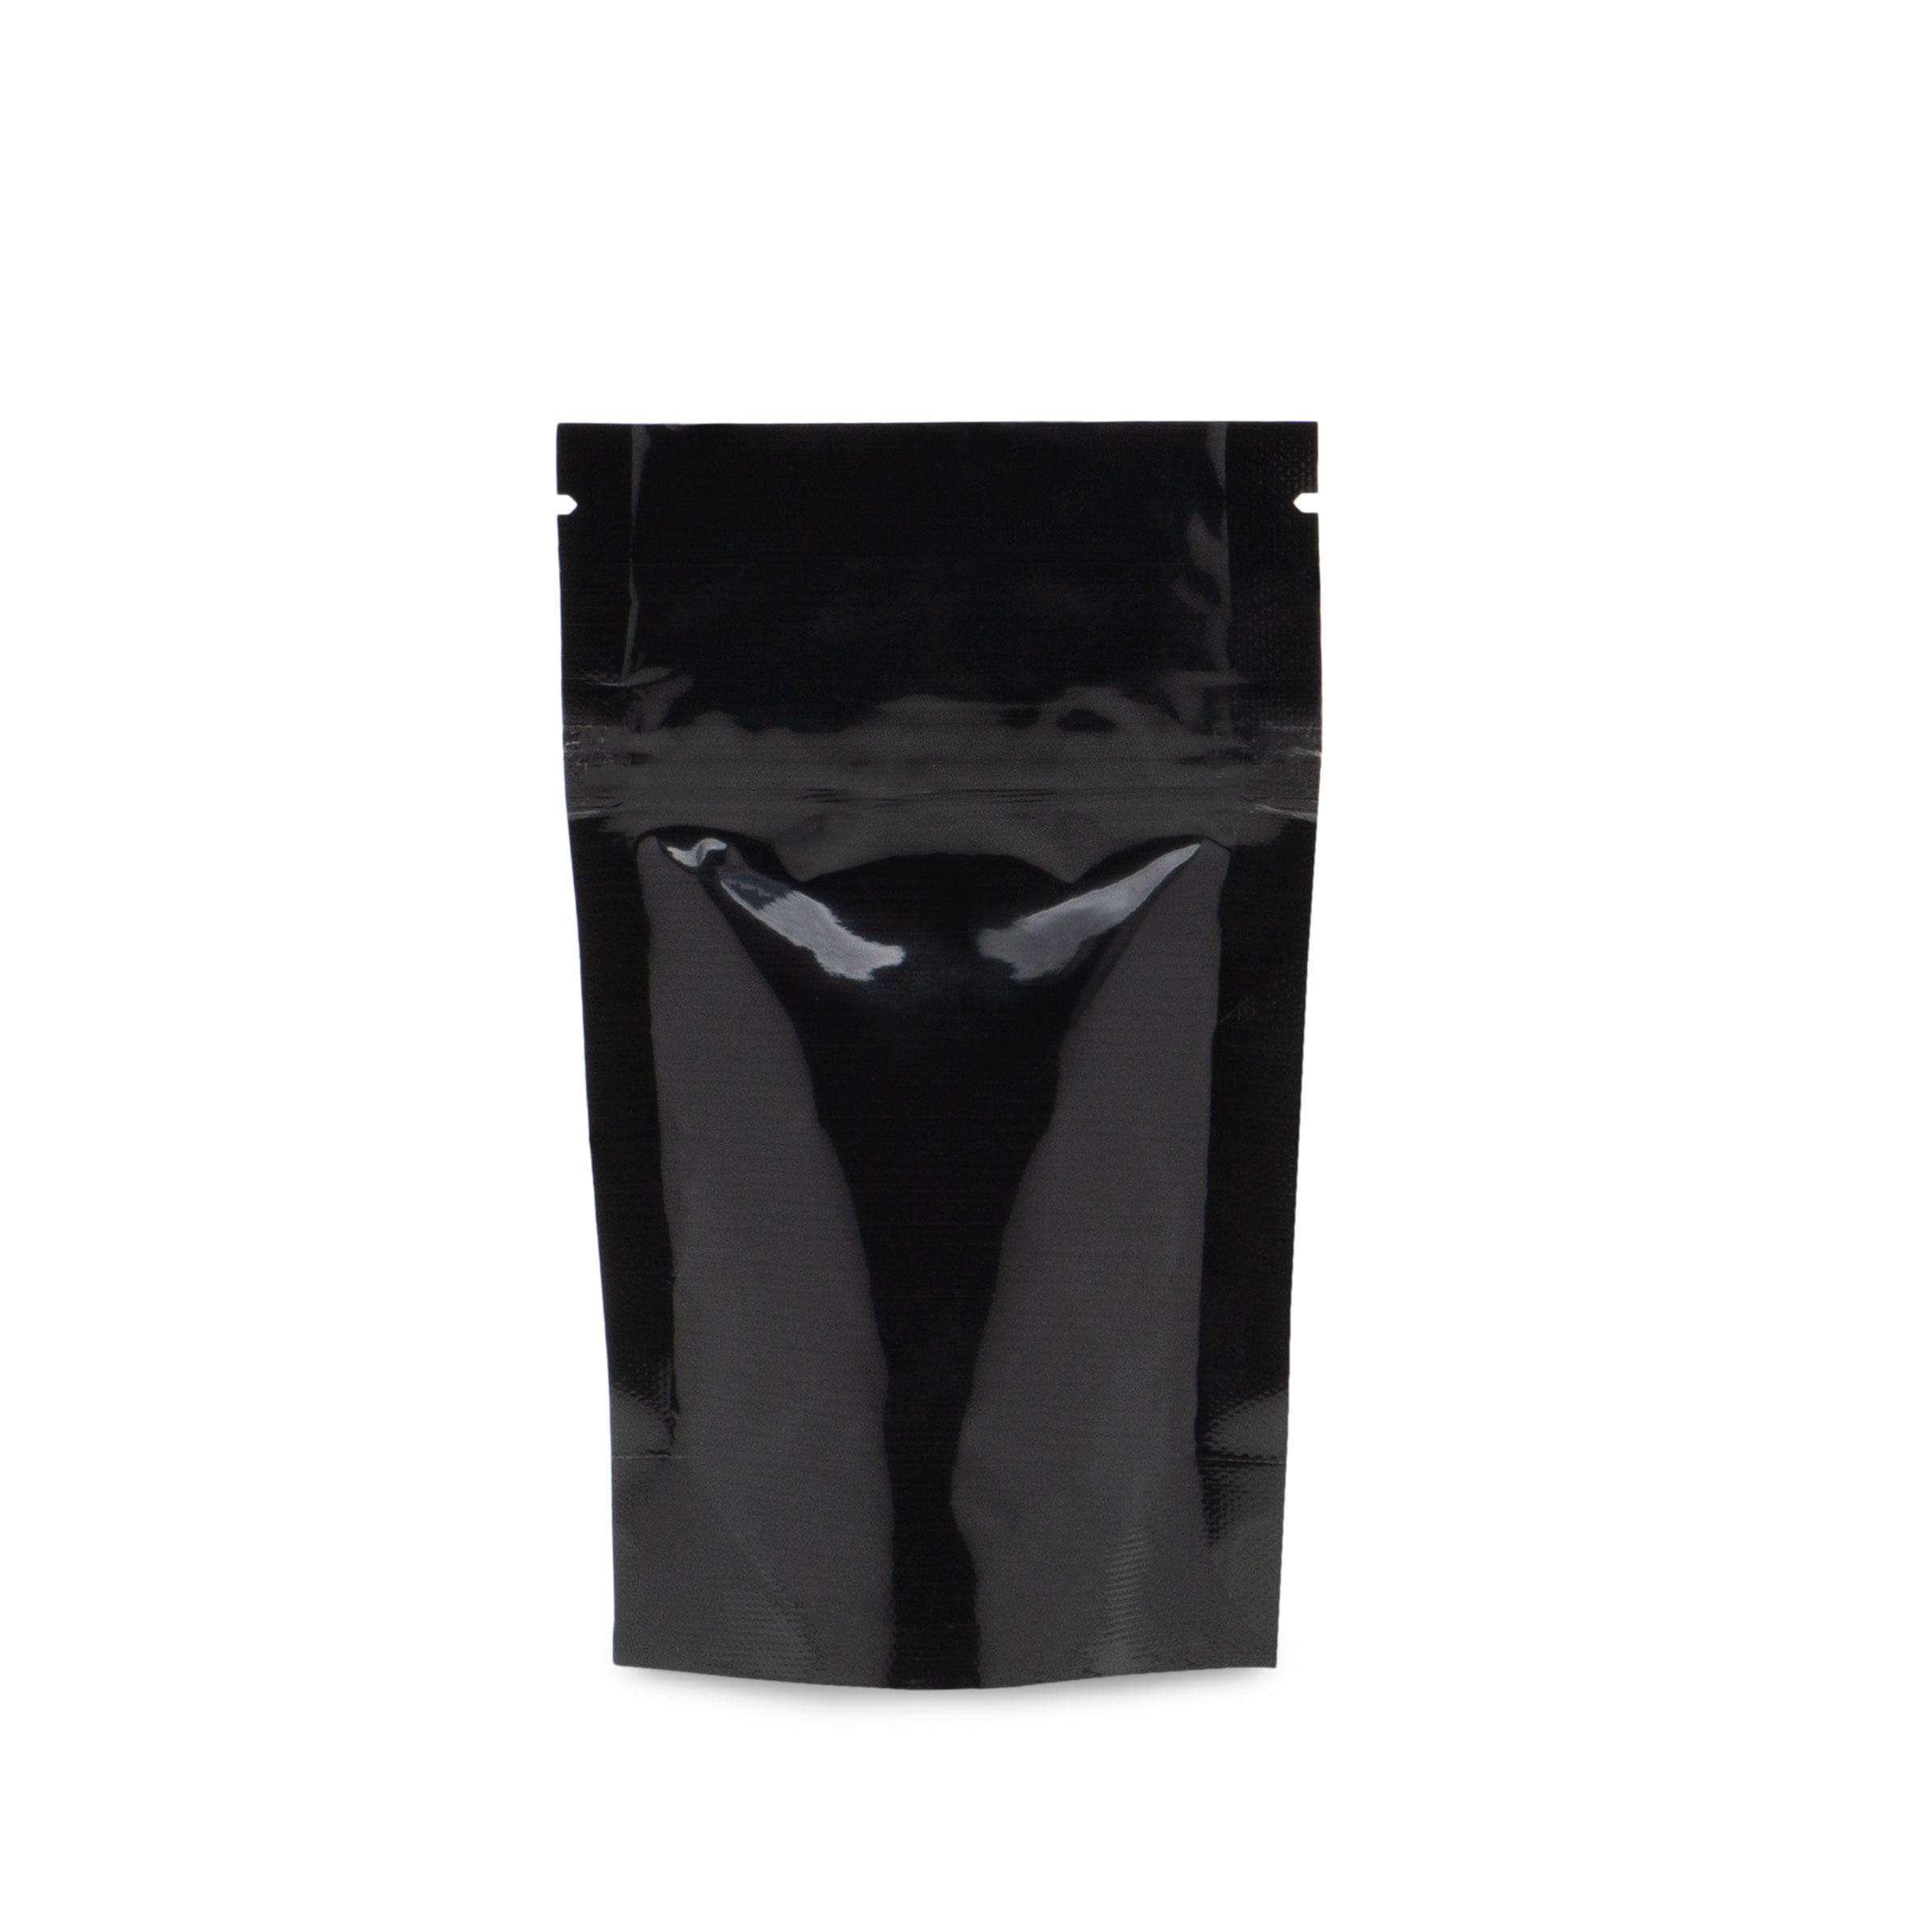 CareBlack Child Resistant 3.75×6×2 (1/8 oz) – 100 Pack